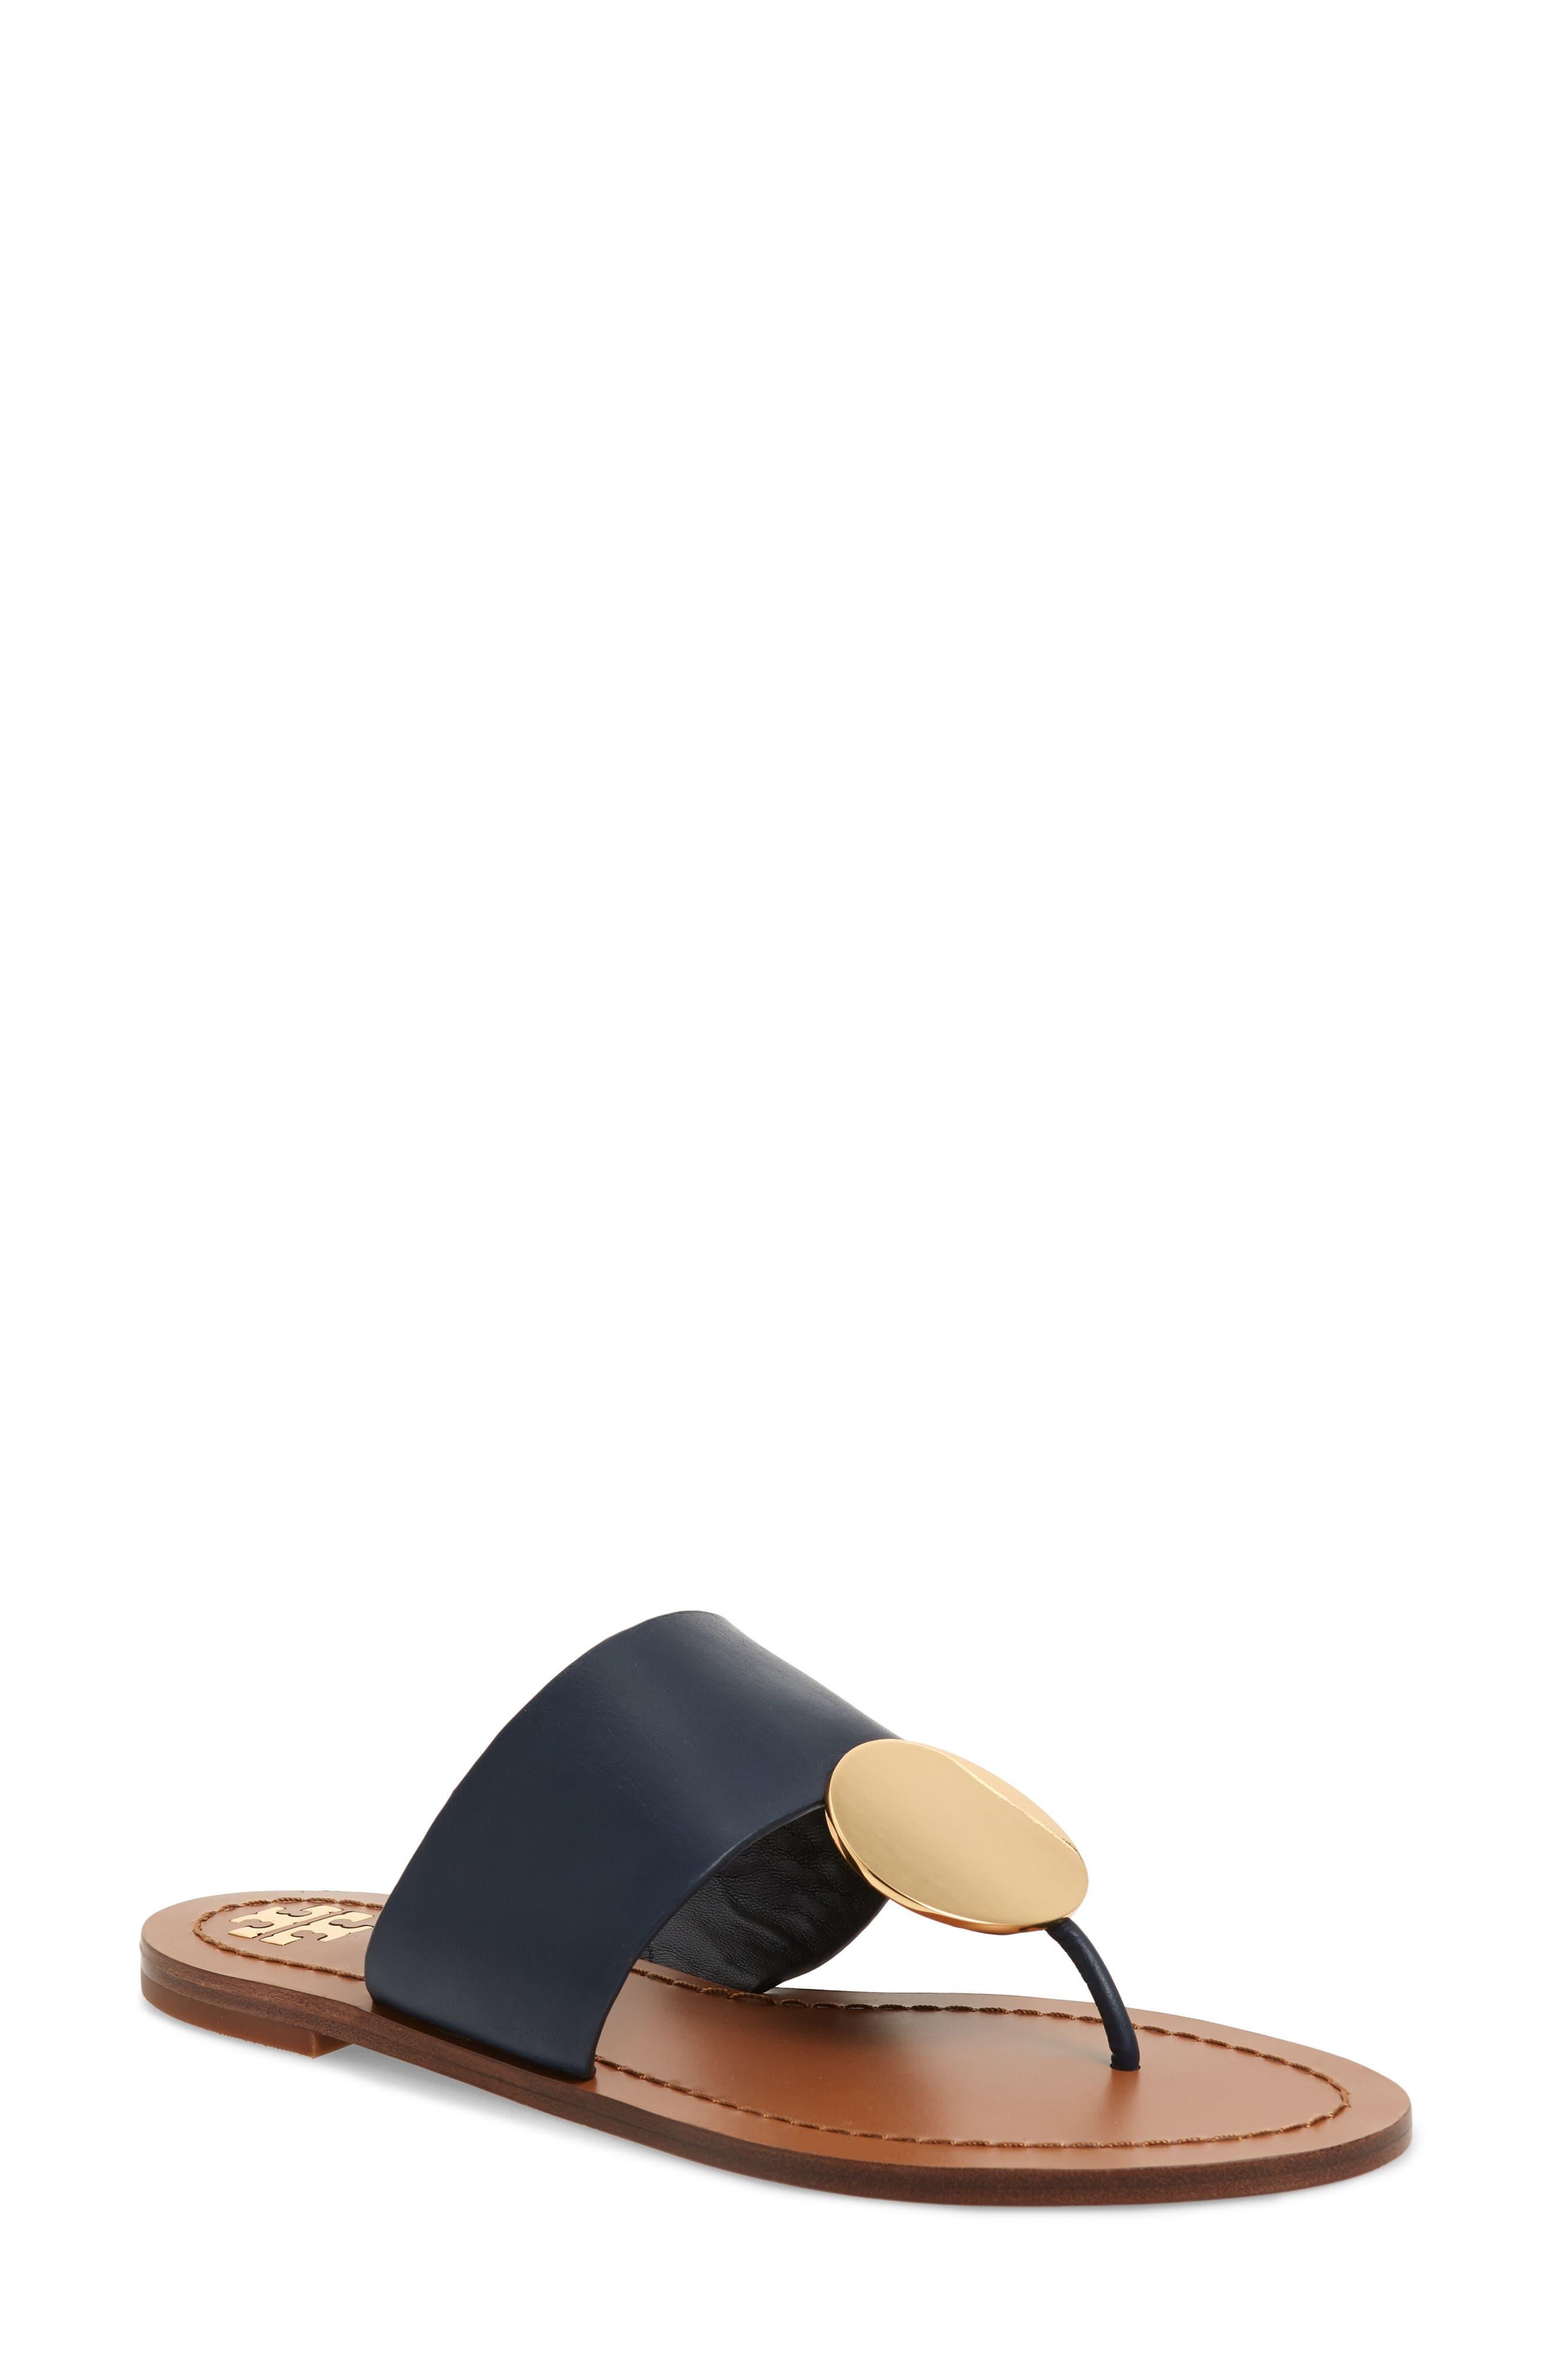 Tory Burch Patos Sandal- Blue